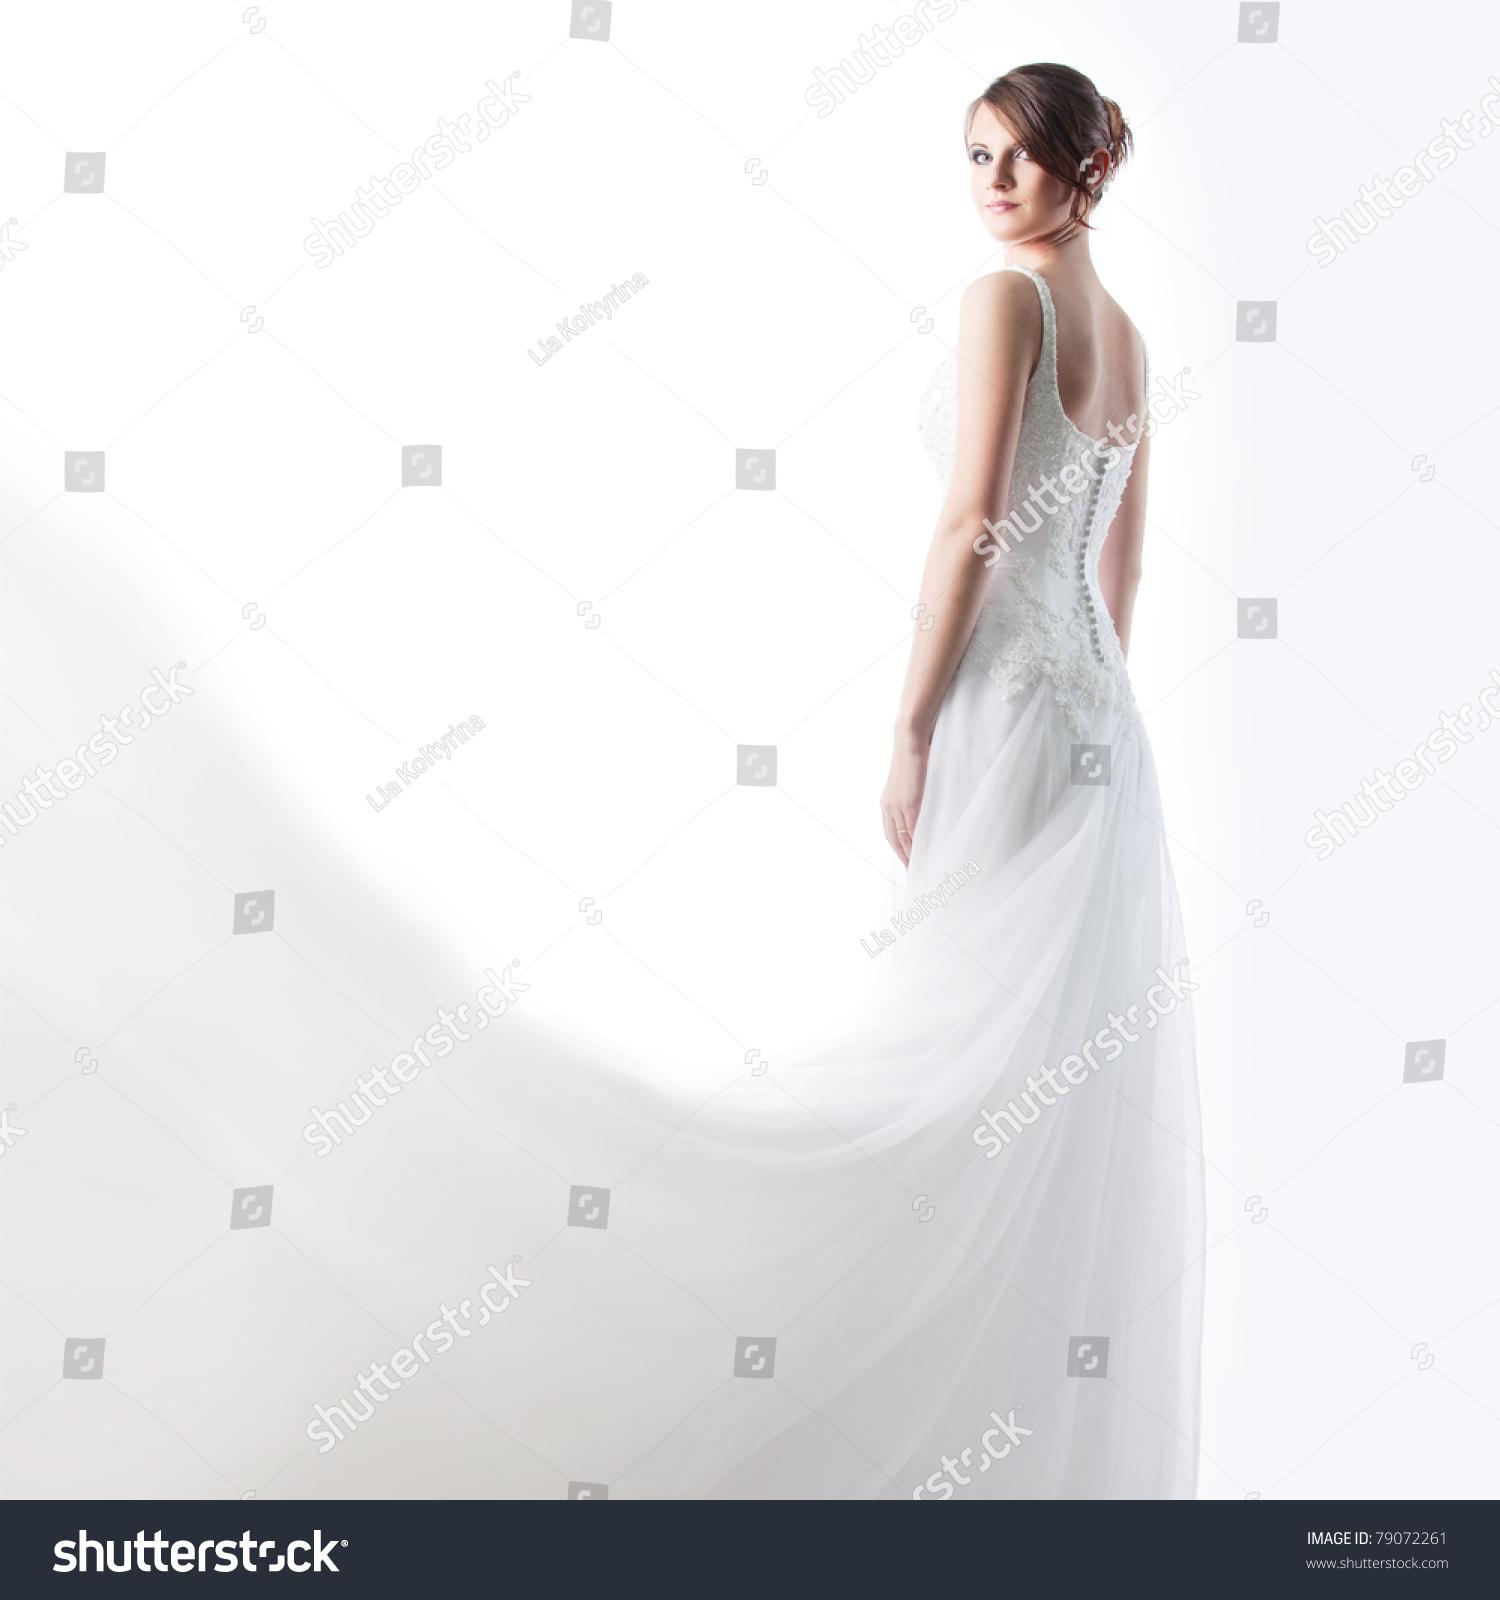 The Beautiful Bride Dress Up 71